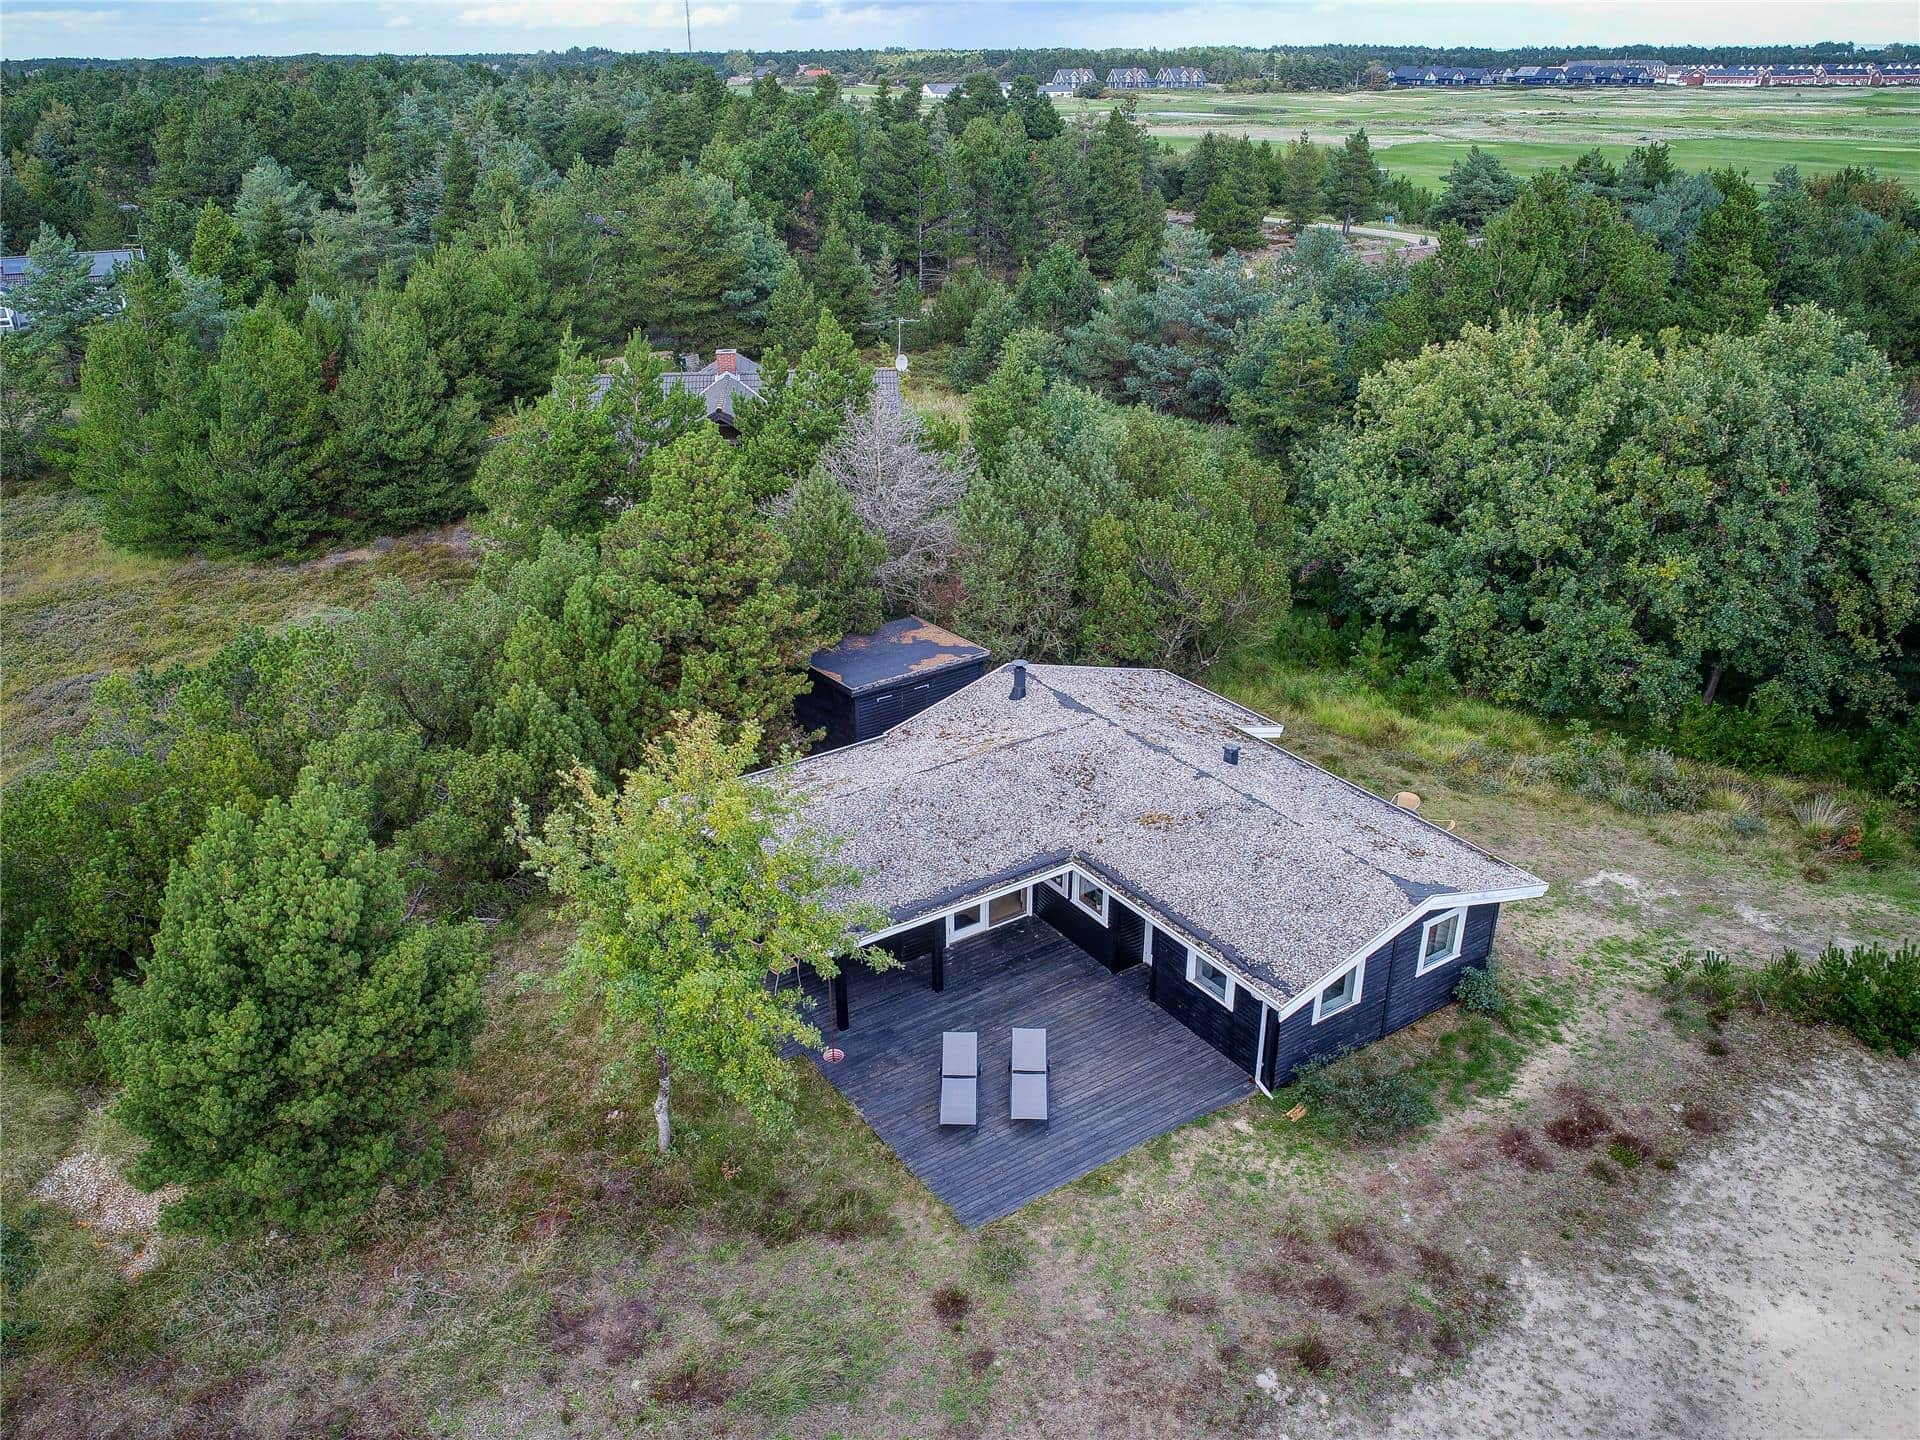 Bild 1-11 Ferienhaus 0358, Helmusager 20, DK - 6792 Rømø